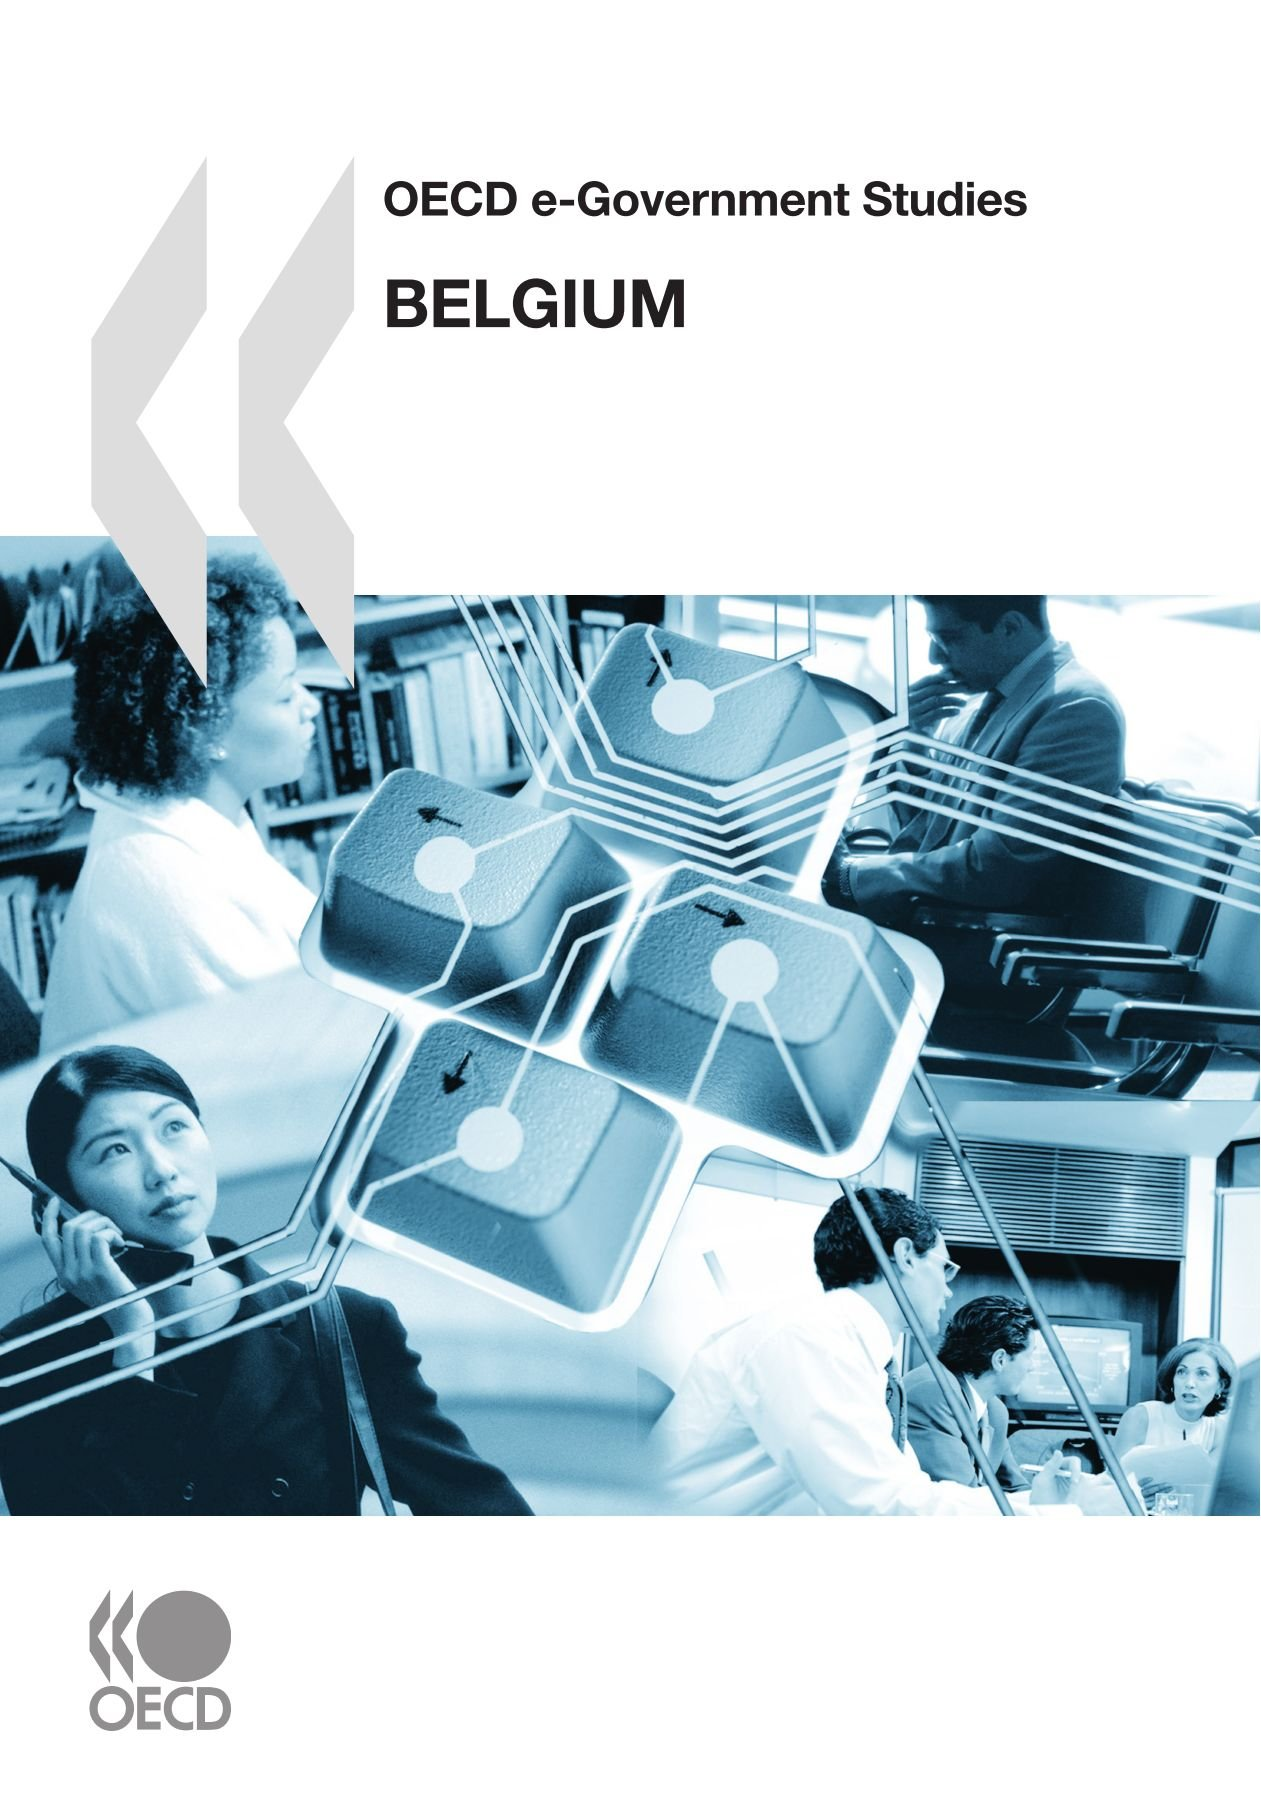 Download OECD e-Government Studies OECD e-Government Studies: Belgium 2008 ebook